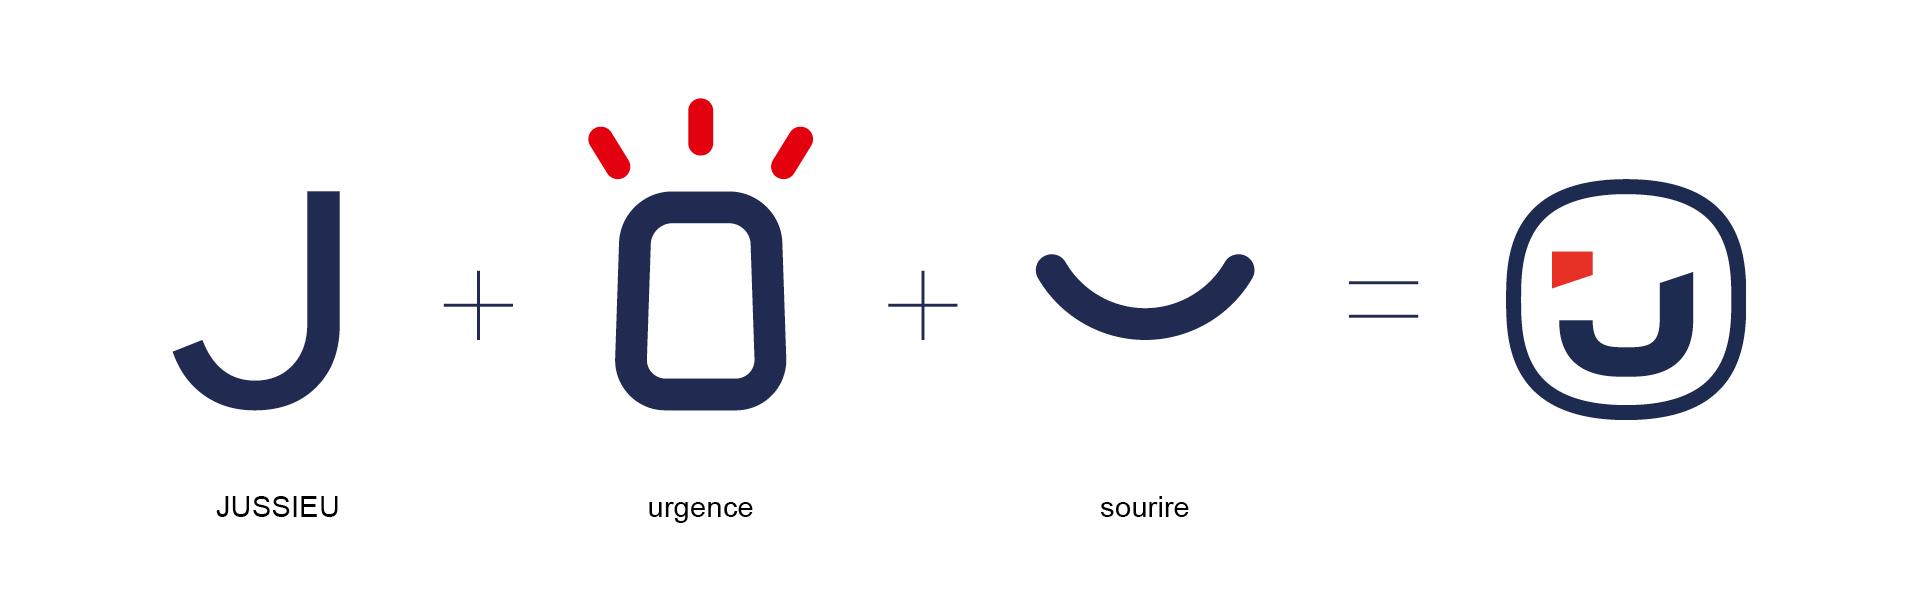 branding JUSSIEU, le pictogramme